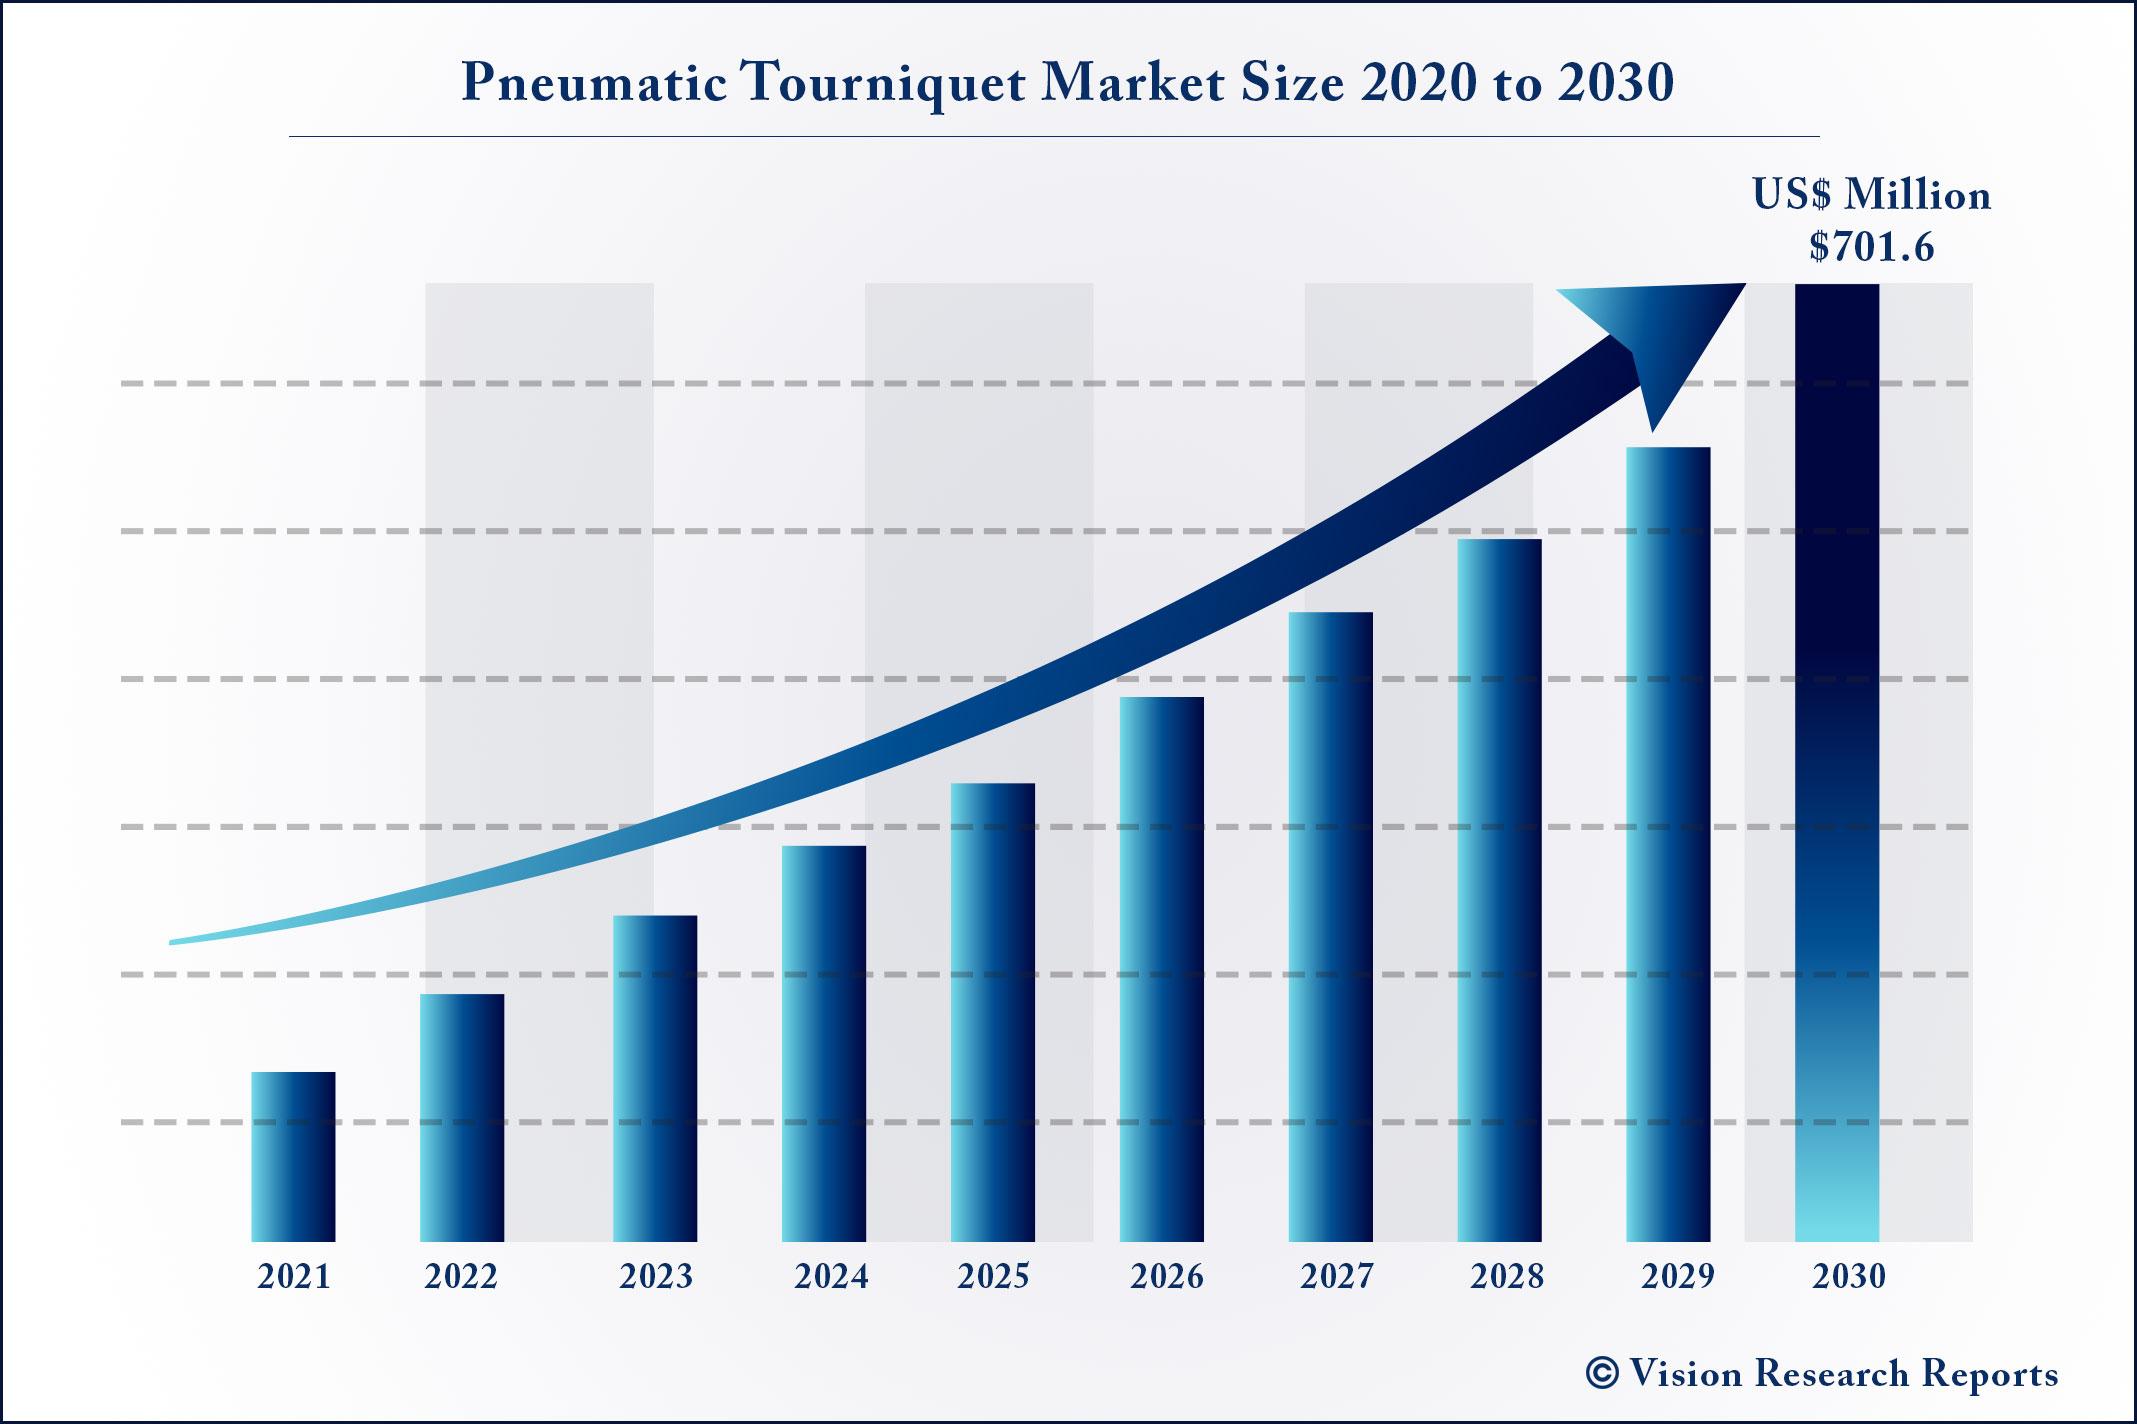 Pneumatic Tourniquet Market Size 2020 to 2030